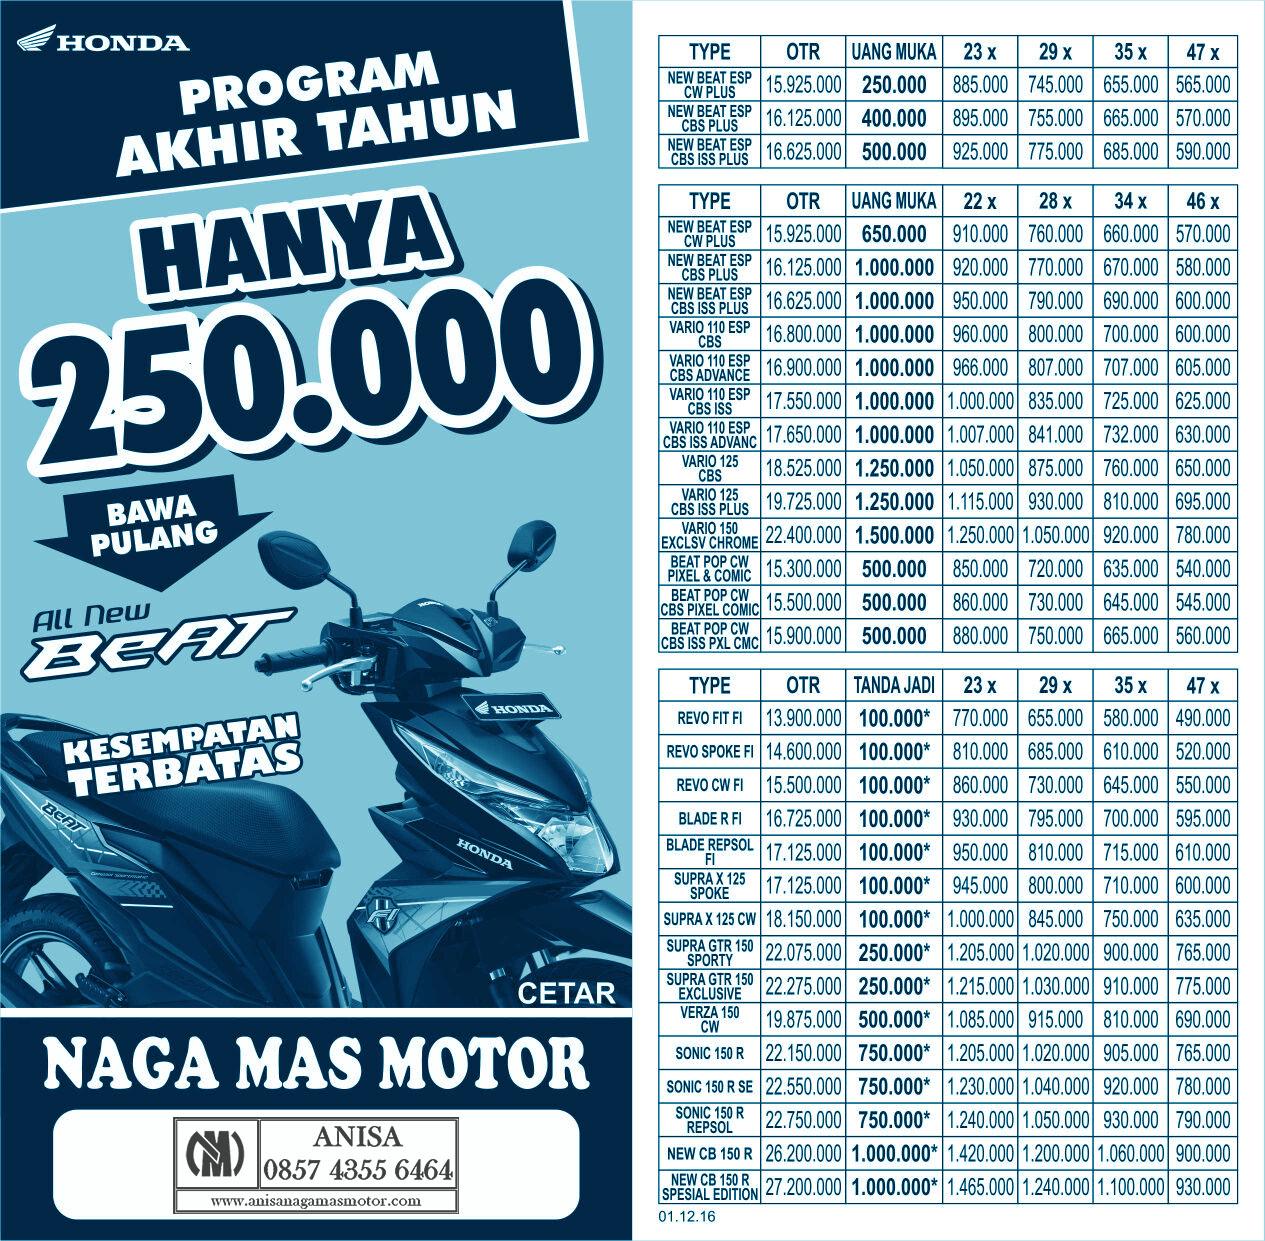 Anisa Counter Sales Dealer Nagamas Motor Klaten New Vario 110 Esp Cbs Iss Grande White Kab Semarang Promo Desember Akhir Tahun 2016